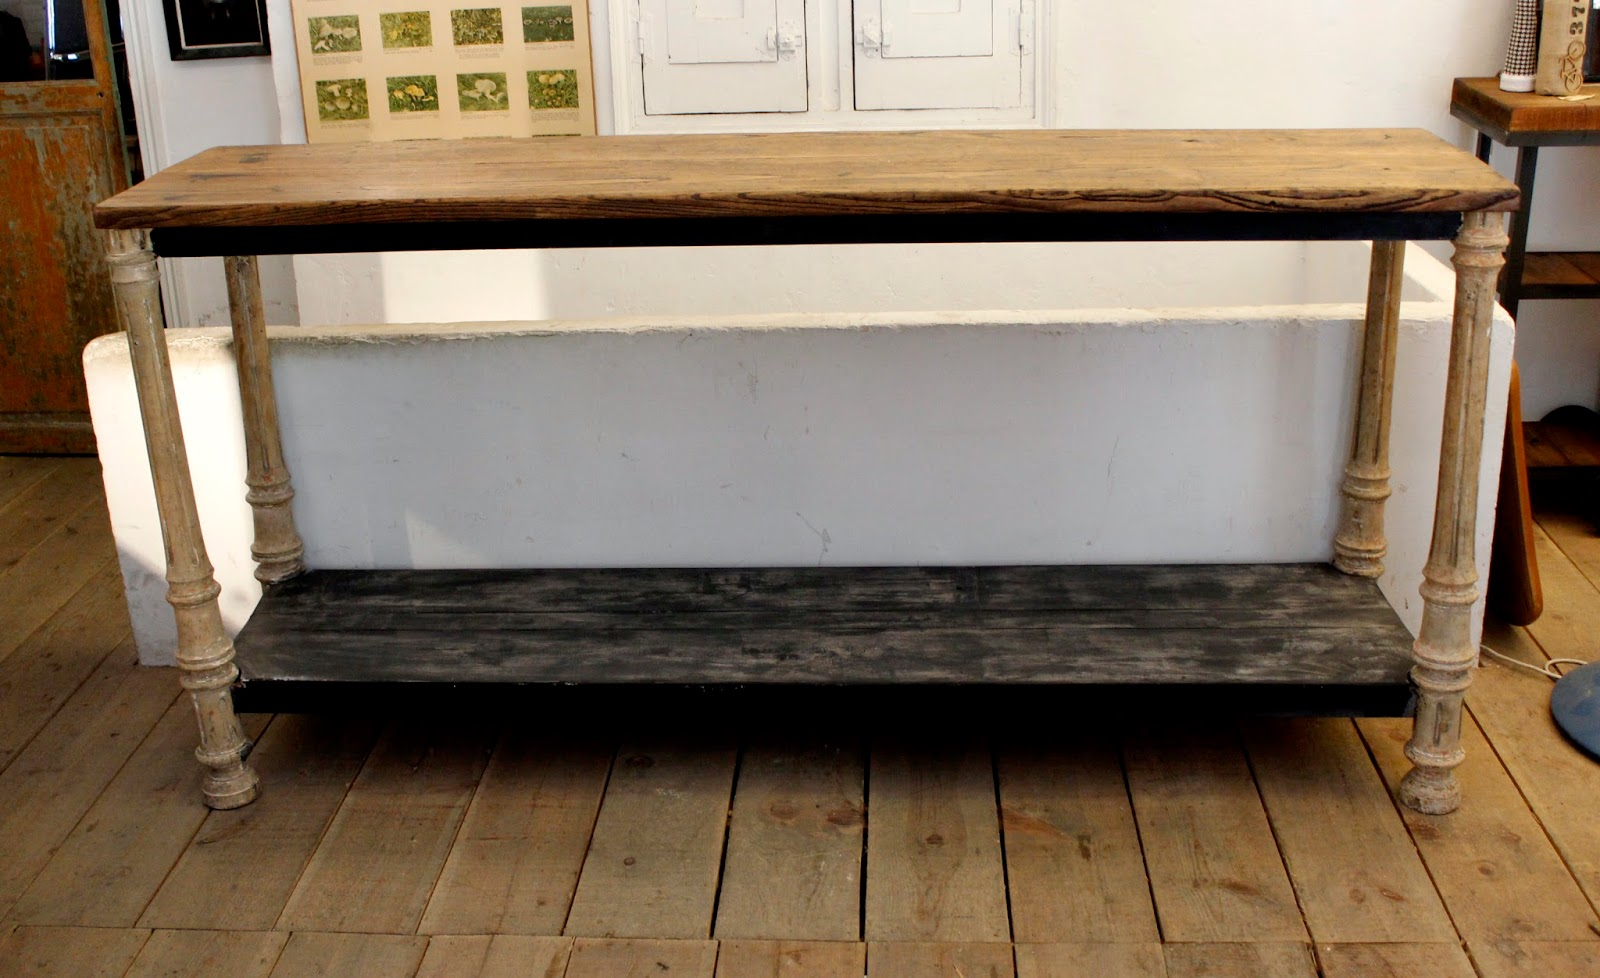 Comprar muebles online beautiful muebles madera decapada for Compra de muebles online